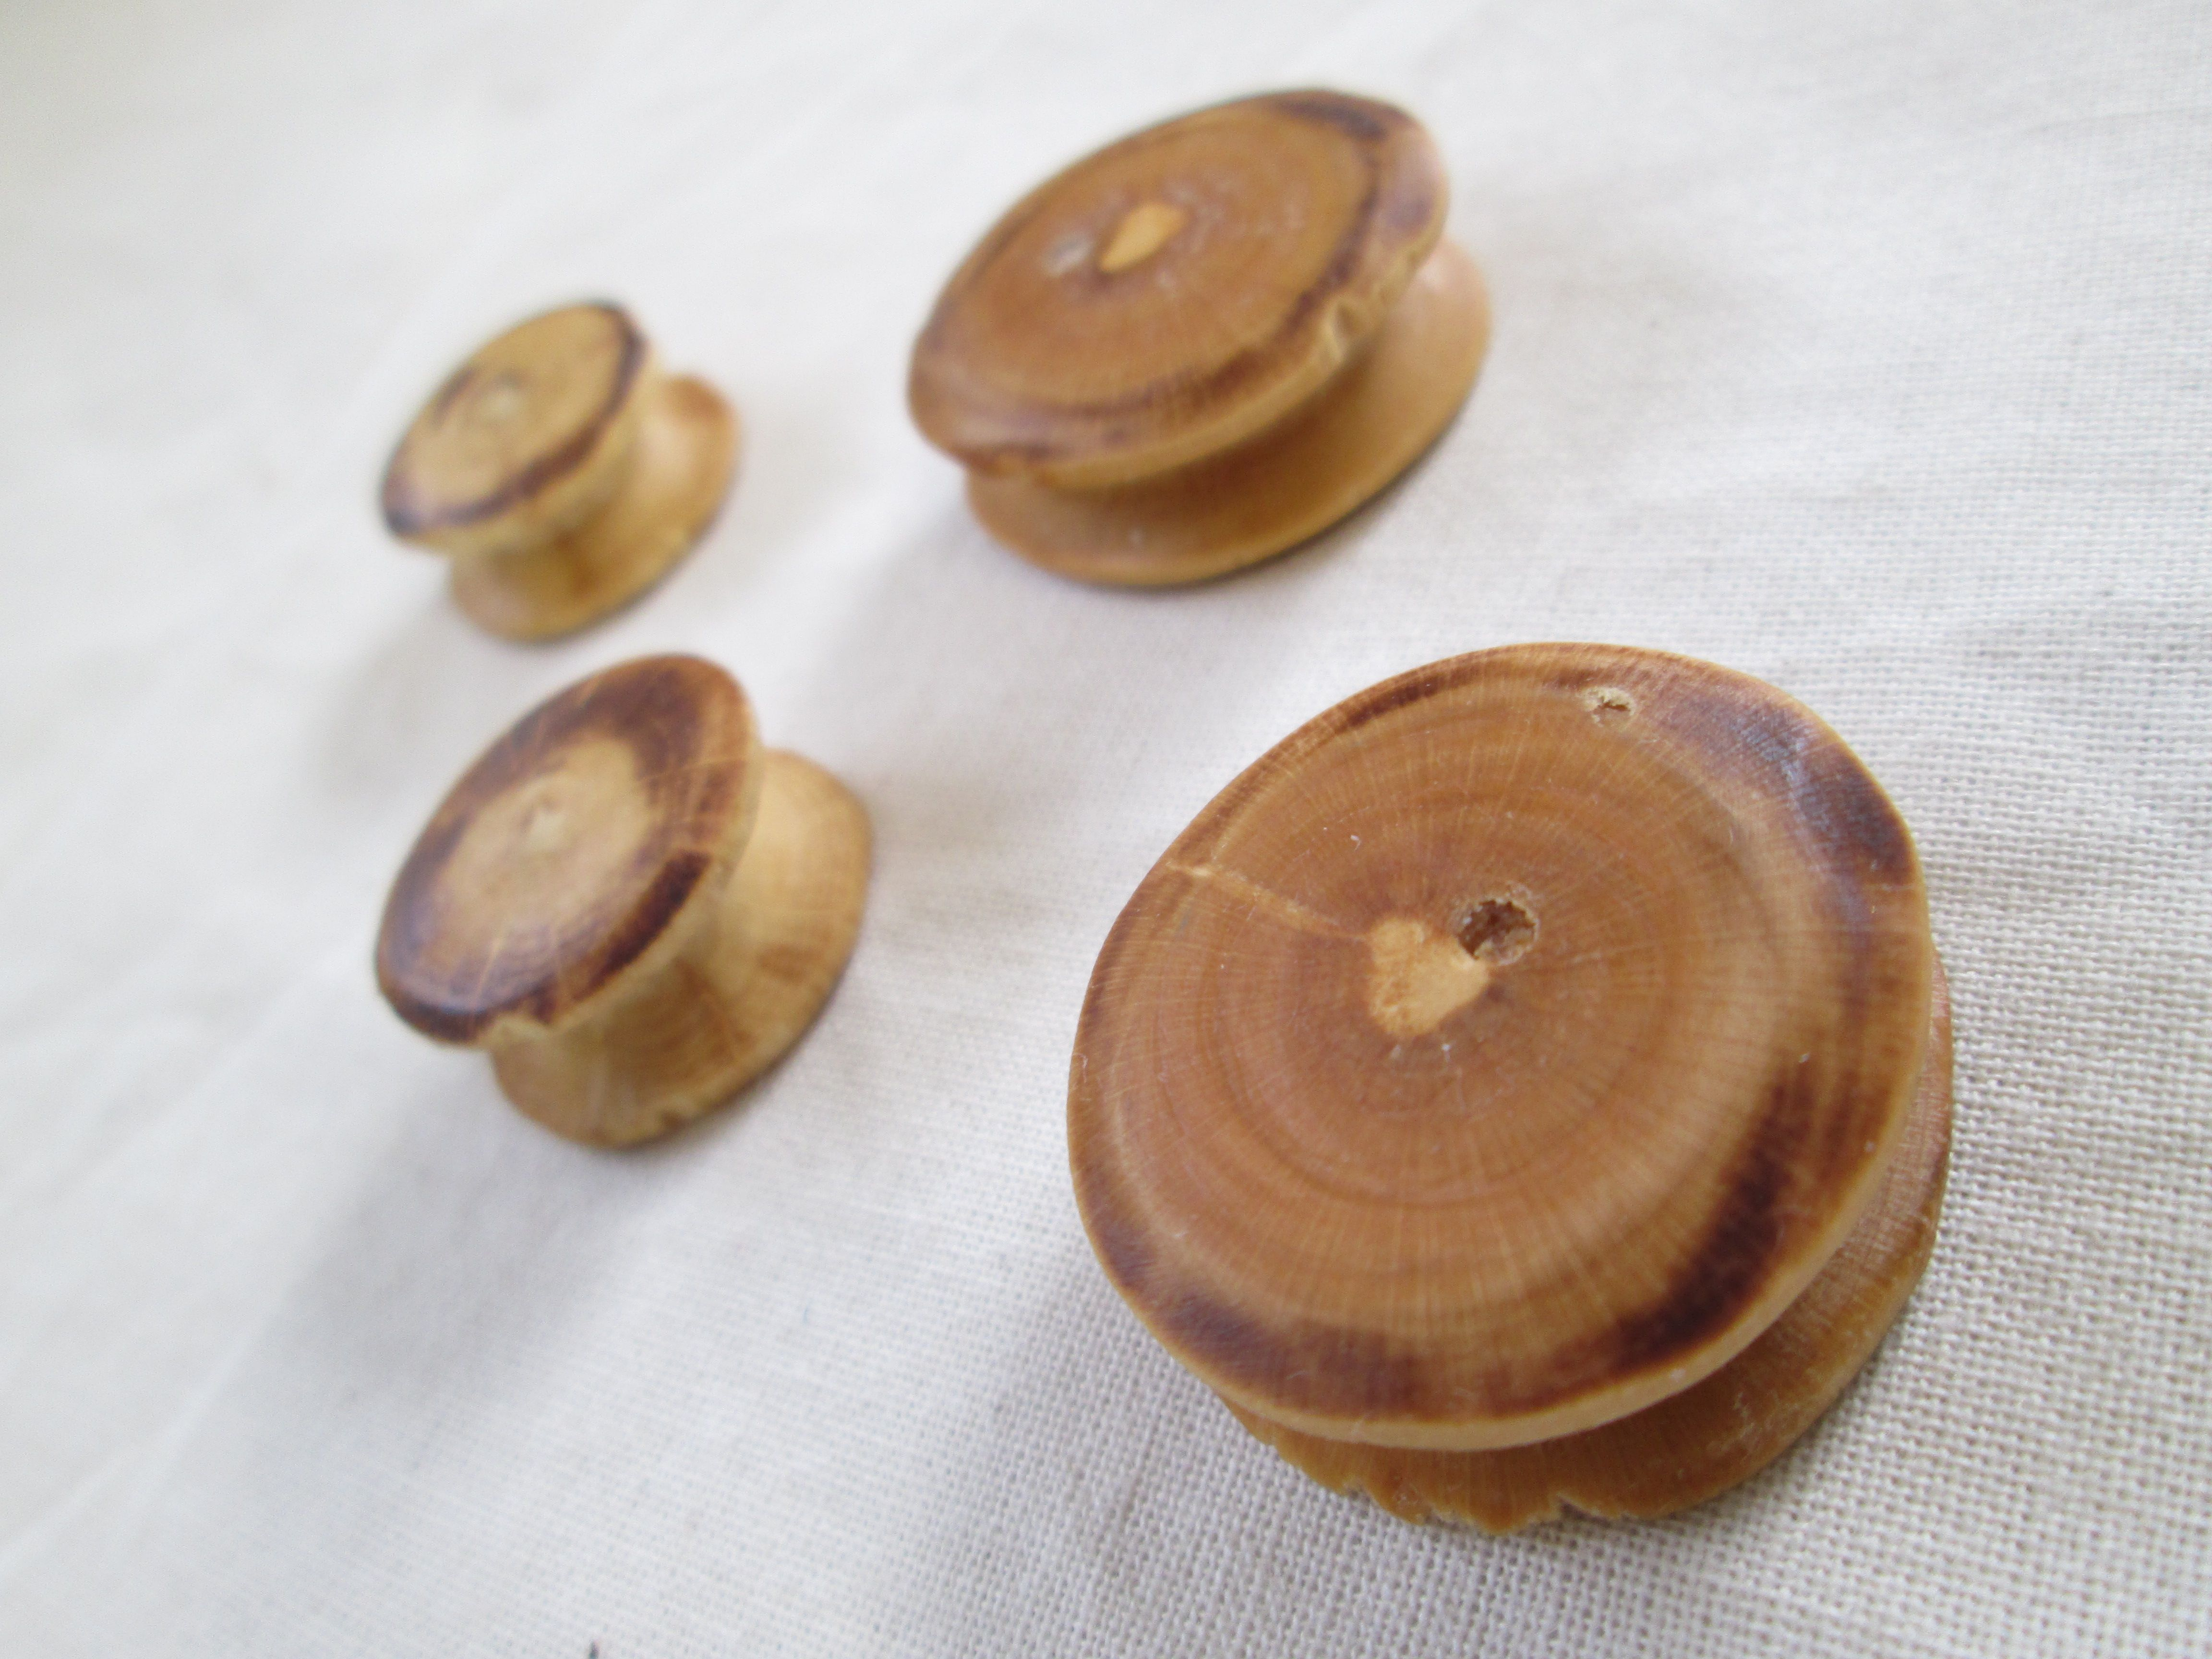 Facsimile Bronze Age wooden ear studs.